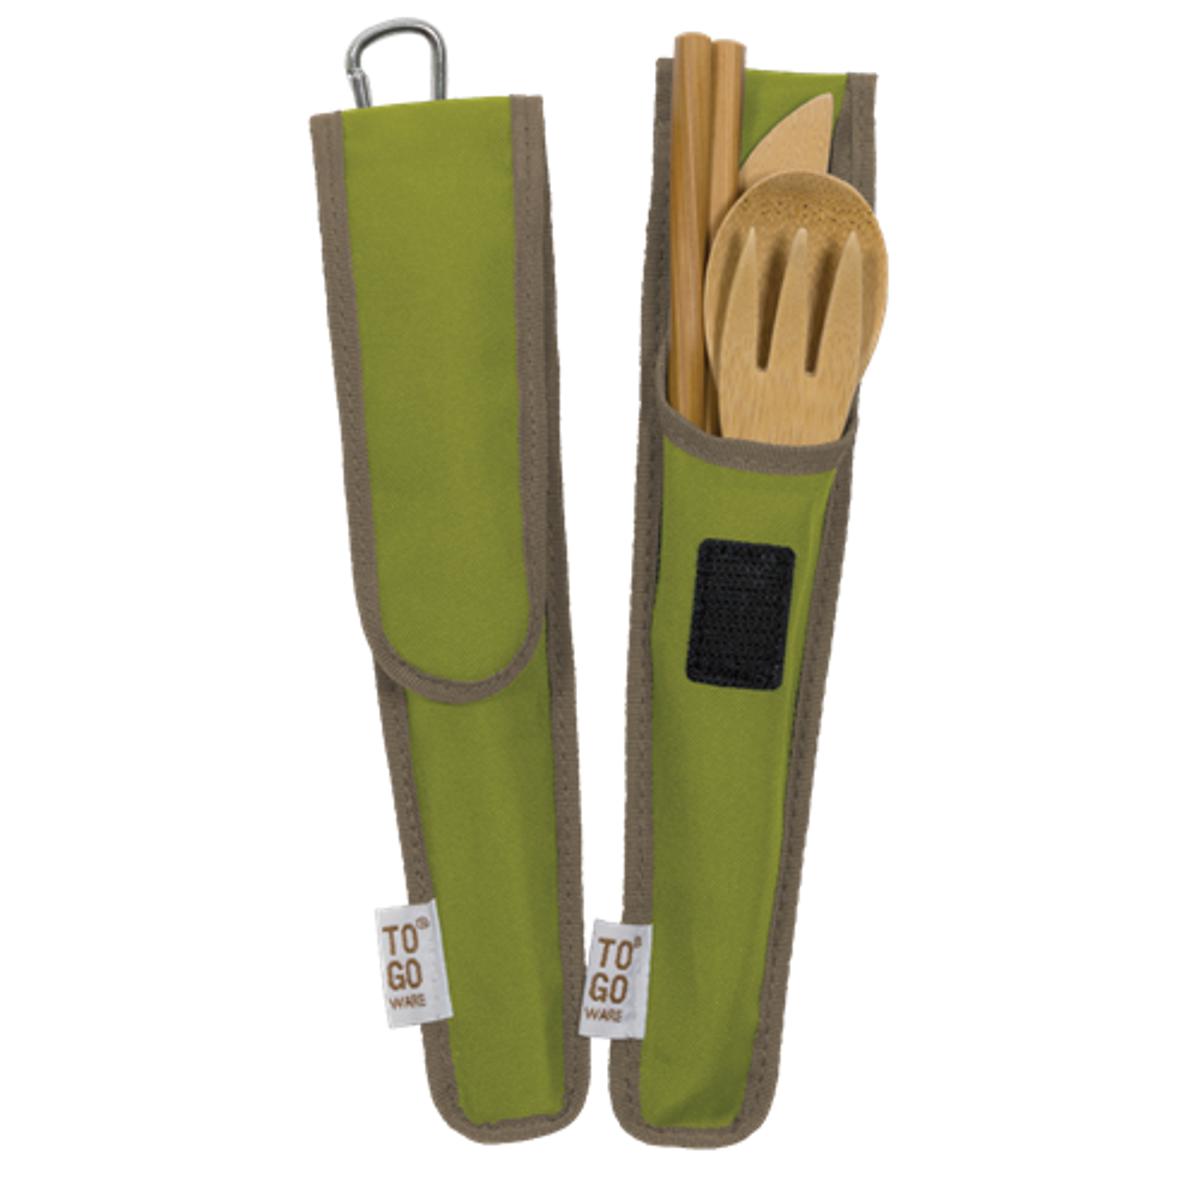 Reisebestikk i bambus, Avocado / To-Go Ware